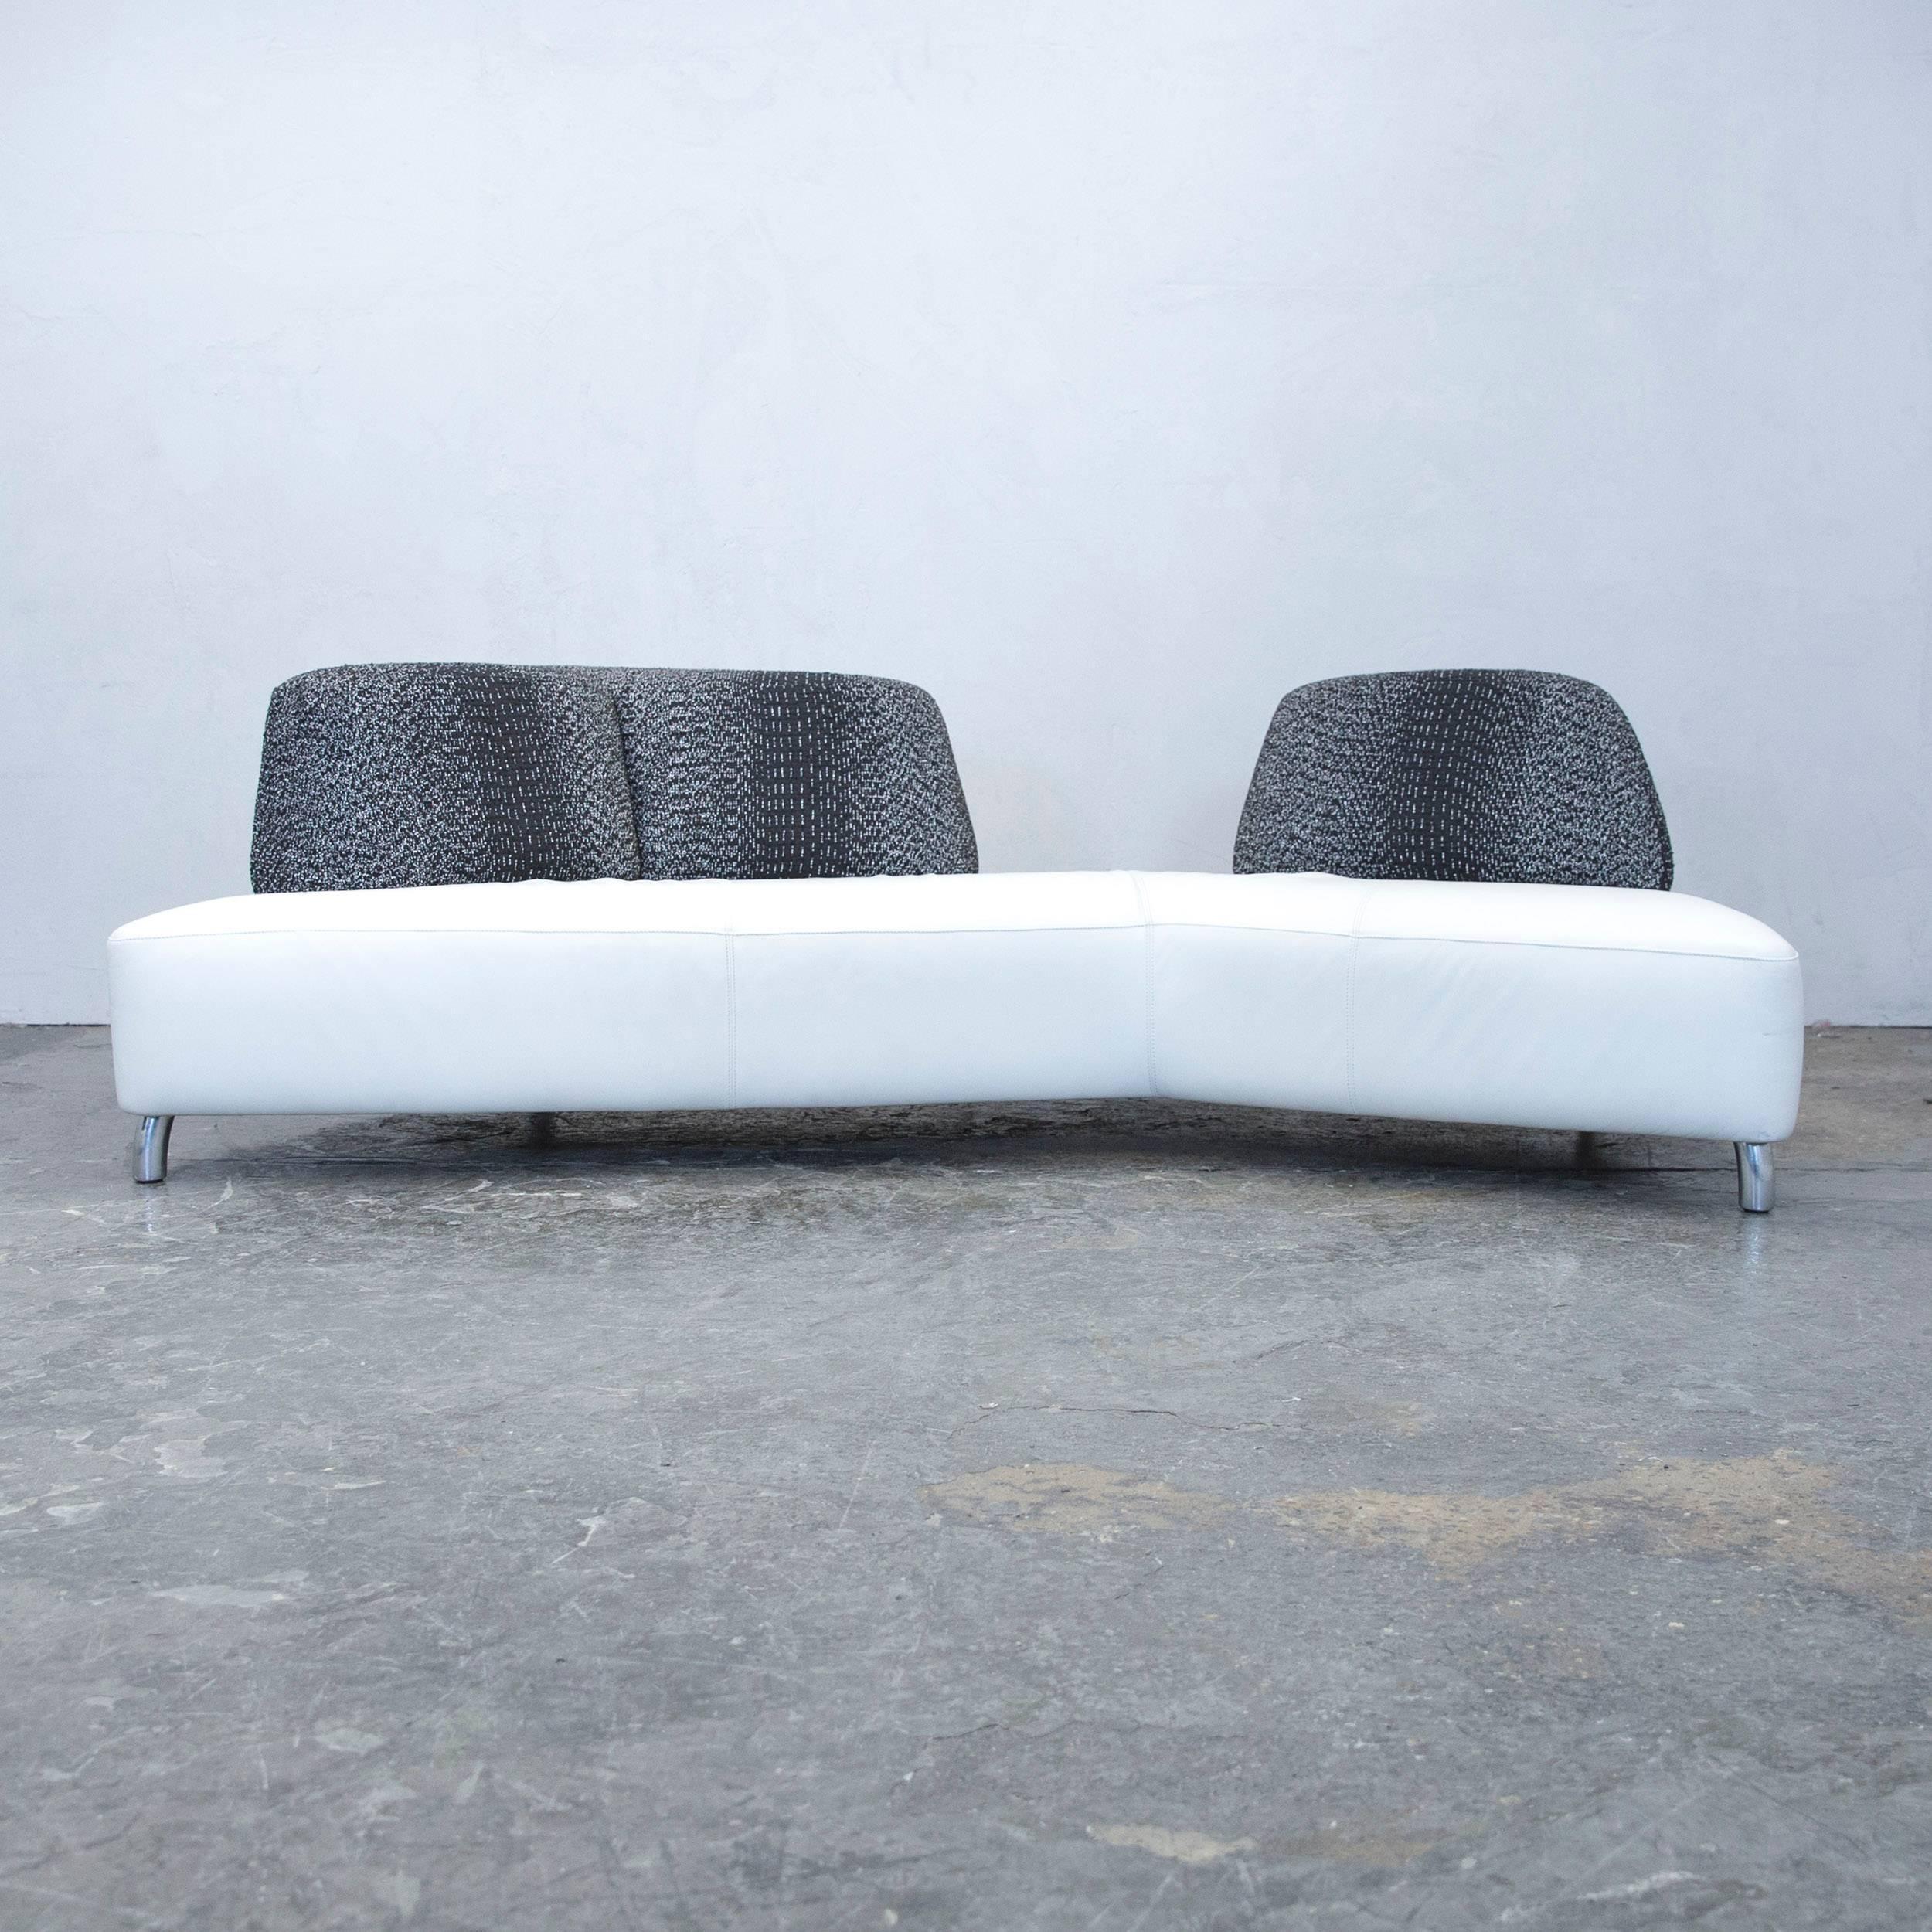 Top Ergebnis 50 Genial sofa Leder Weiß Design Grafiken 2017 Shdy7